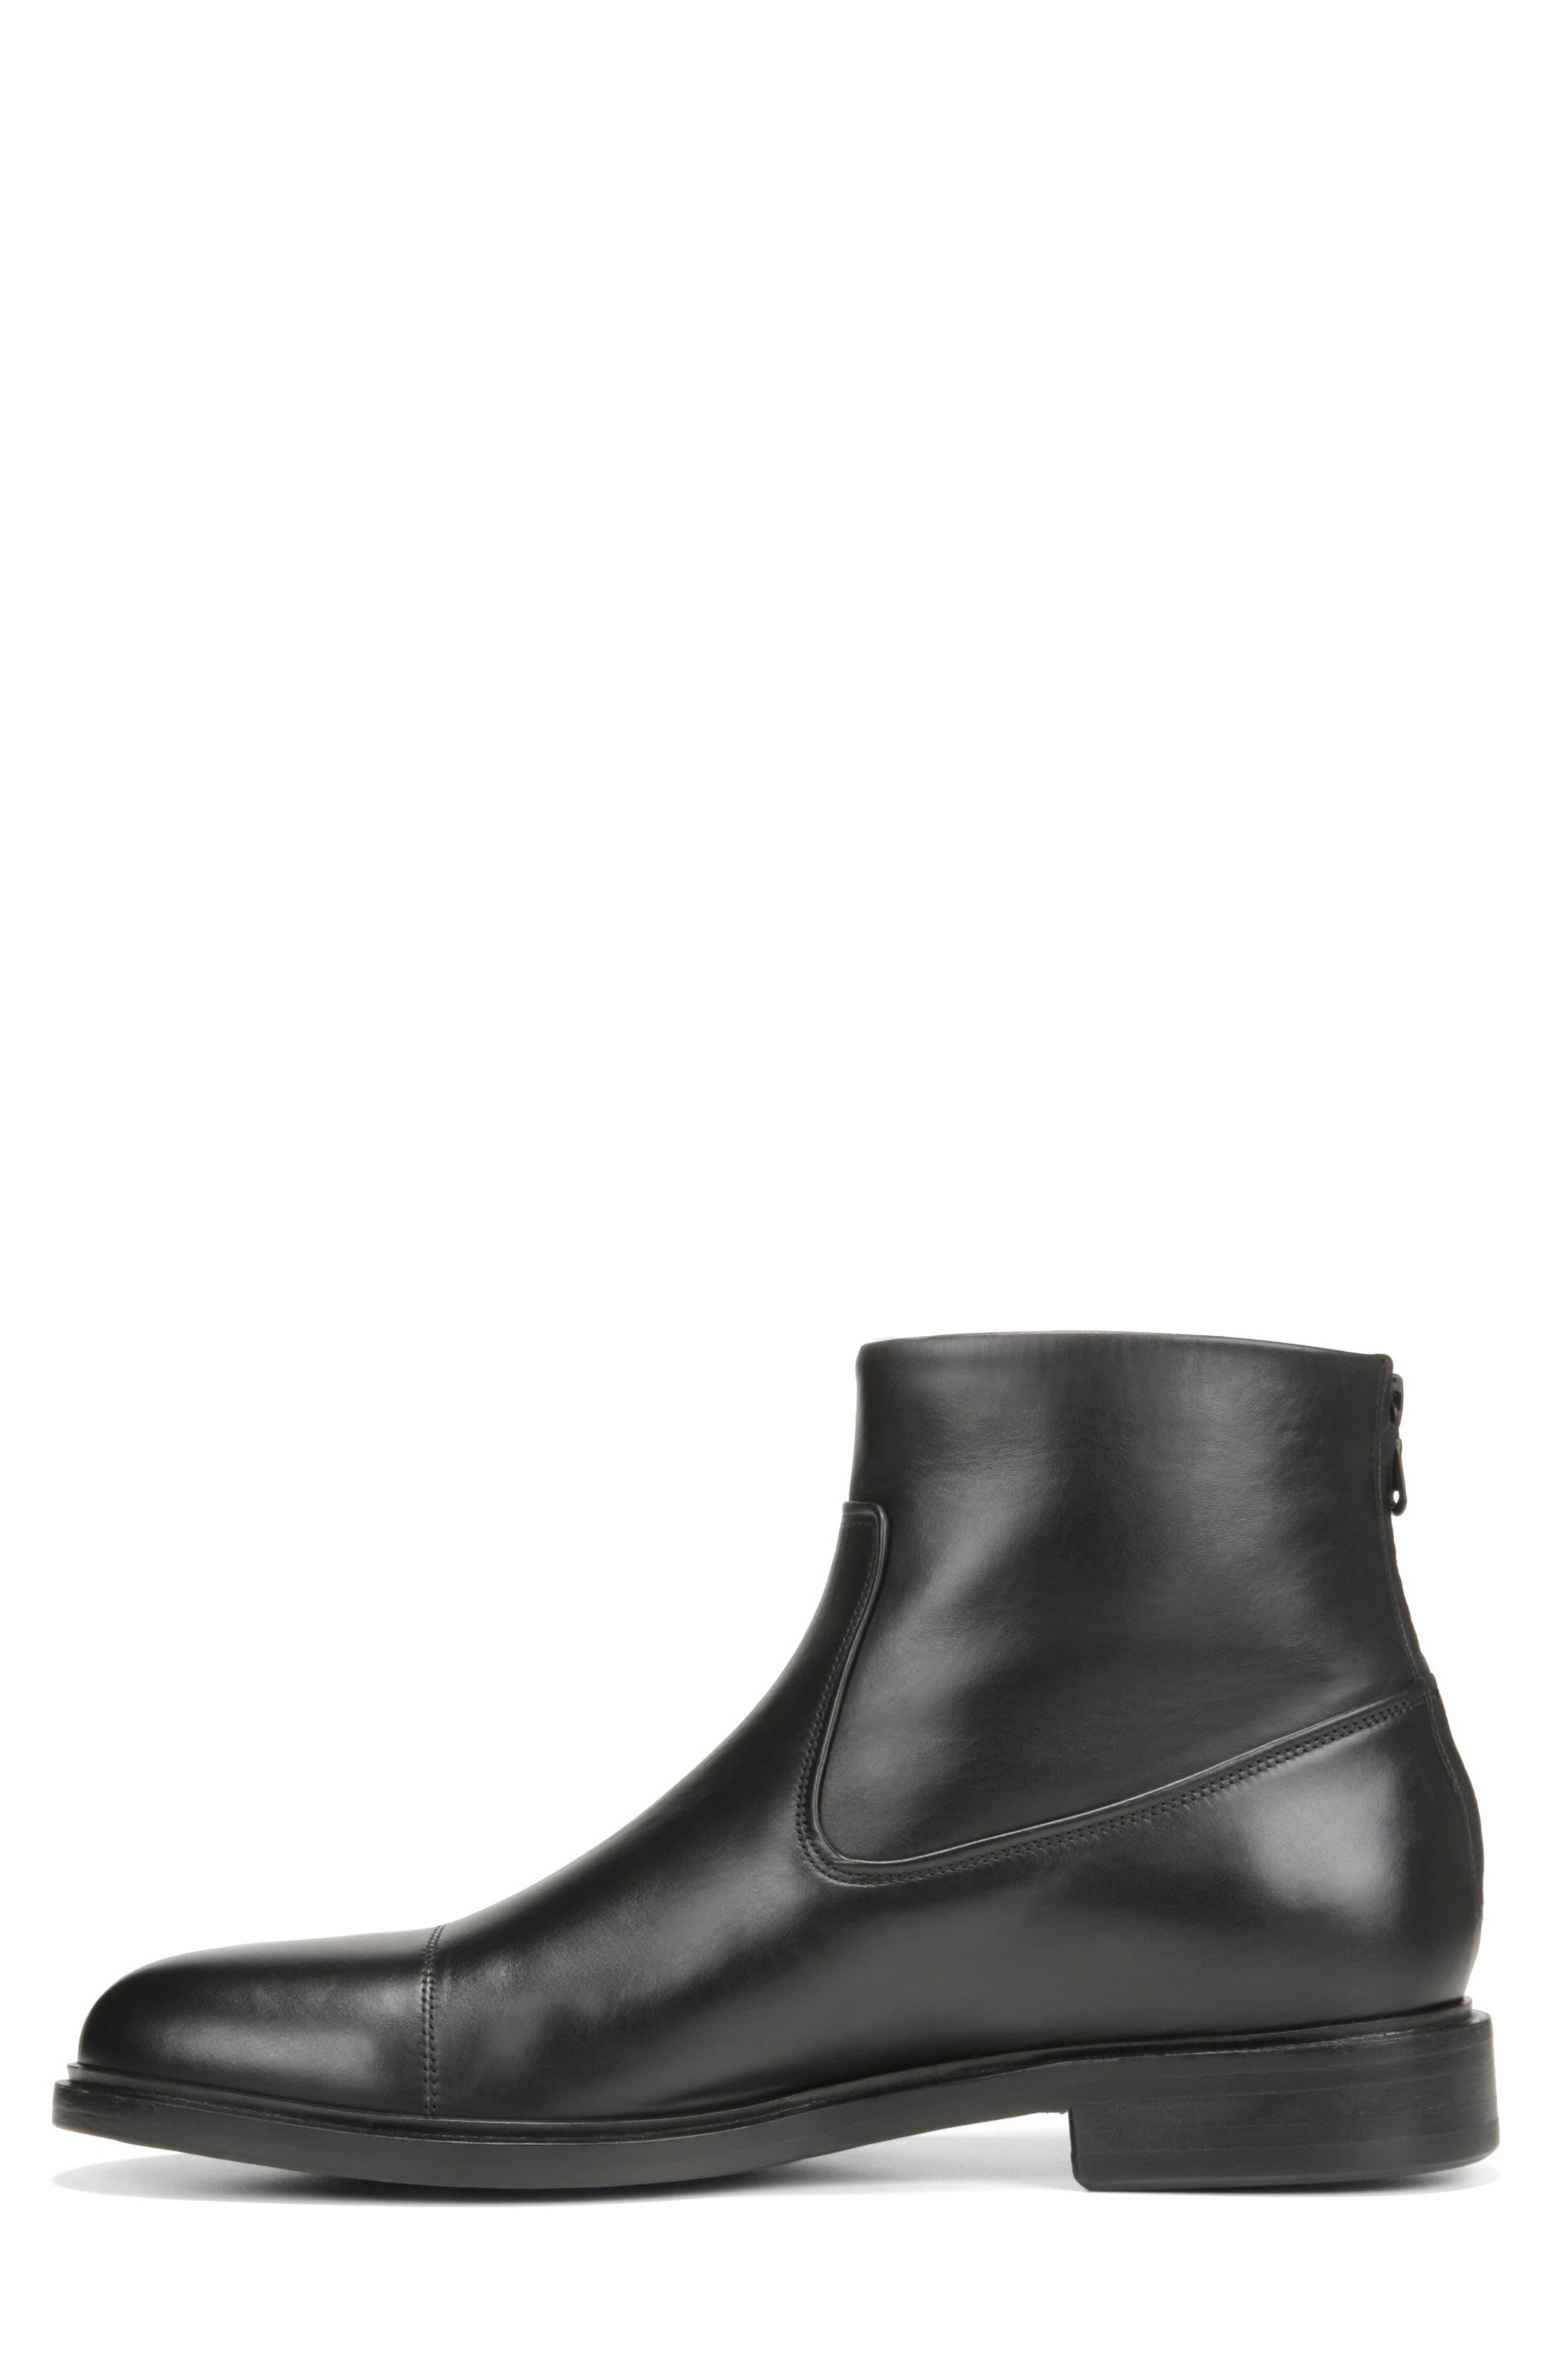 Beckett Zip Boot,                             Alternate thumbnail 9, color,                             BLACK